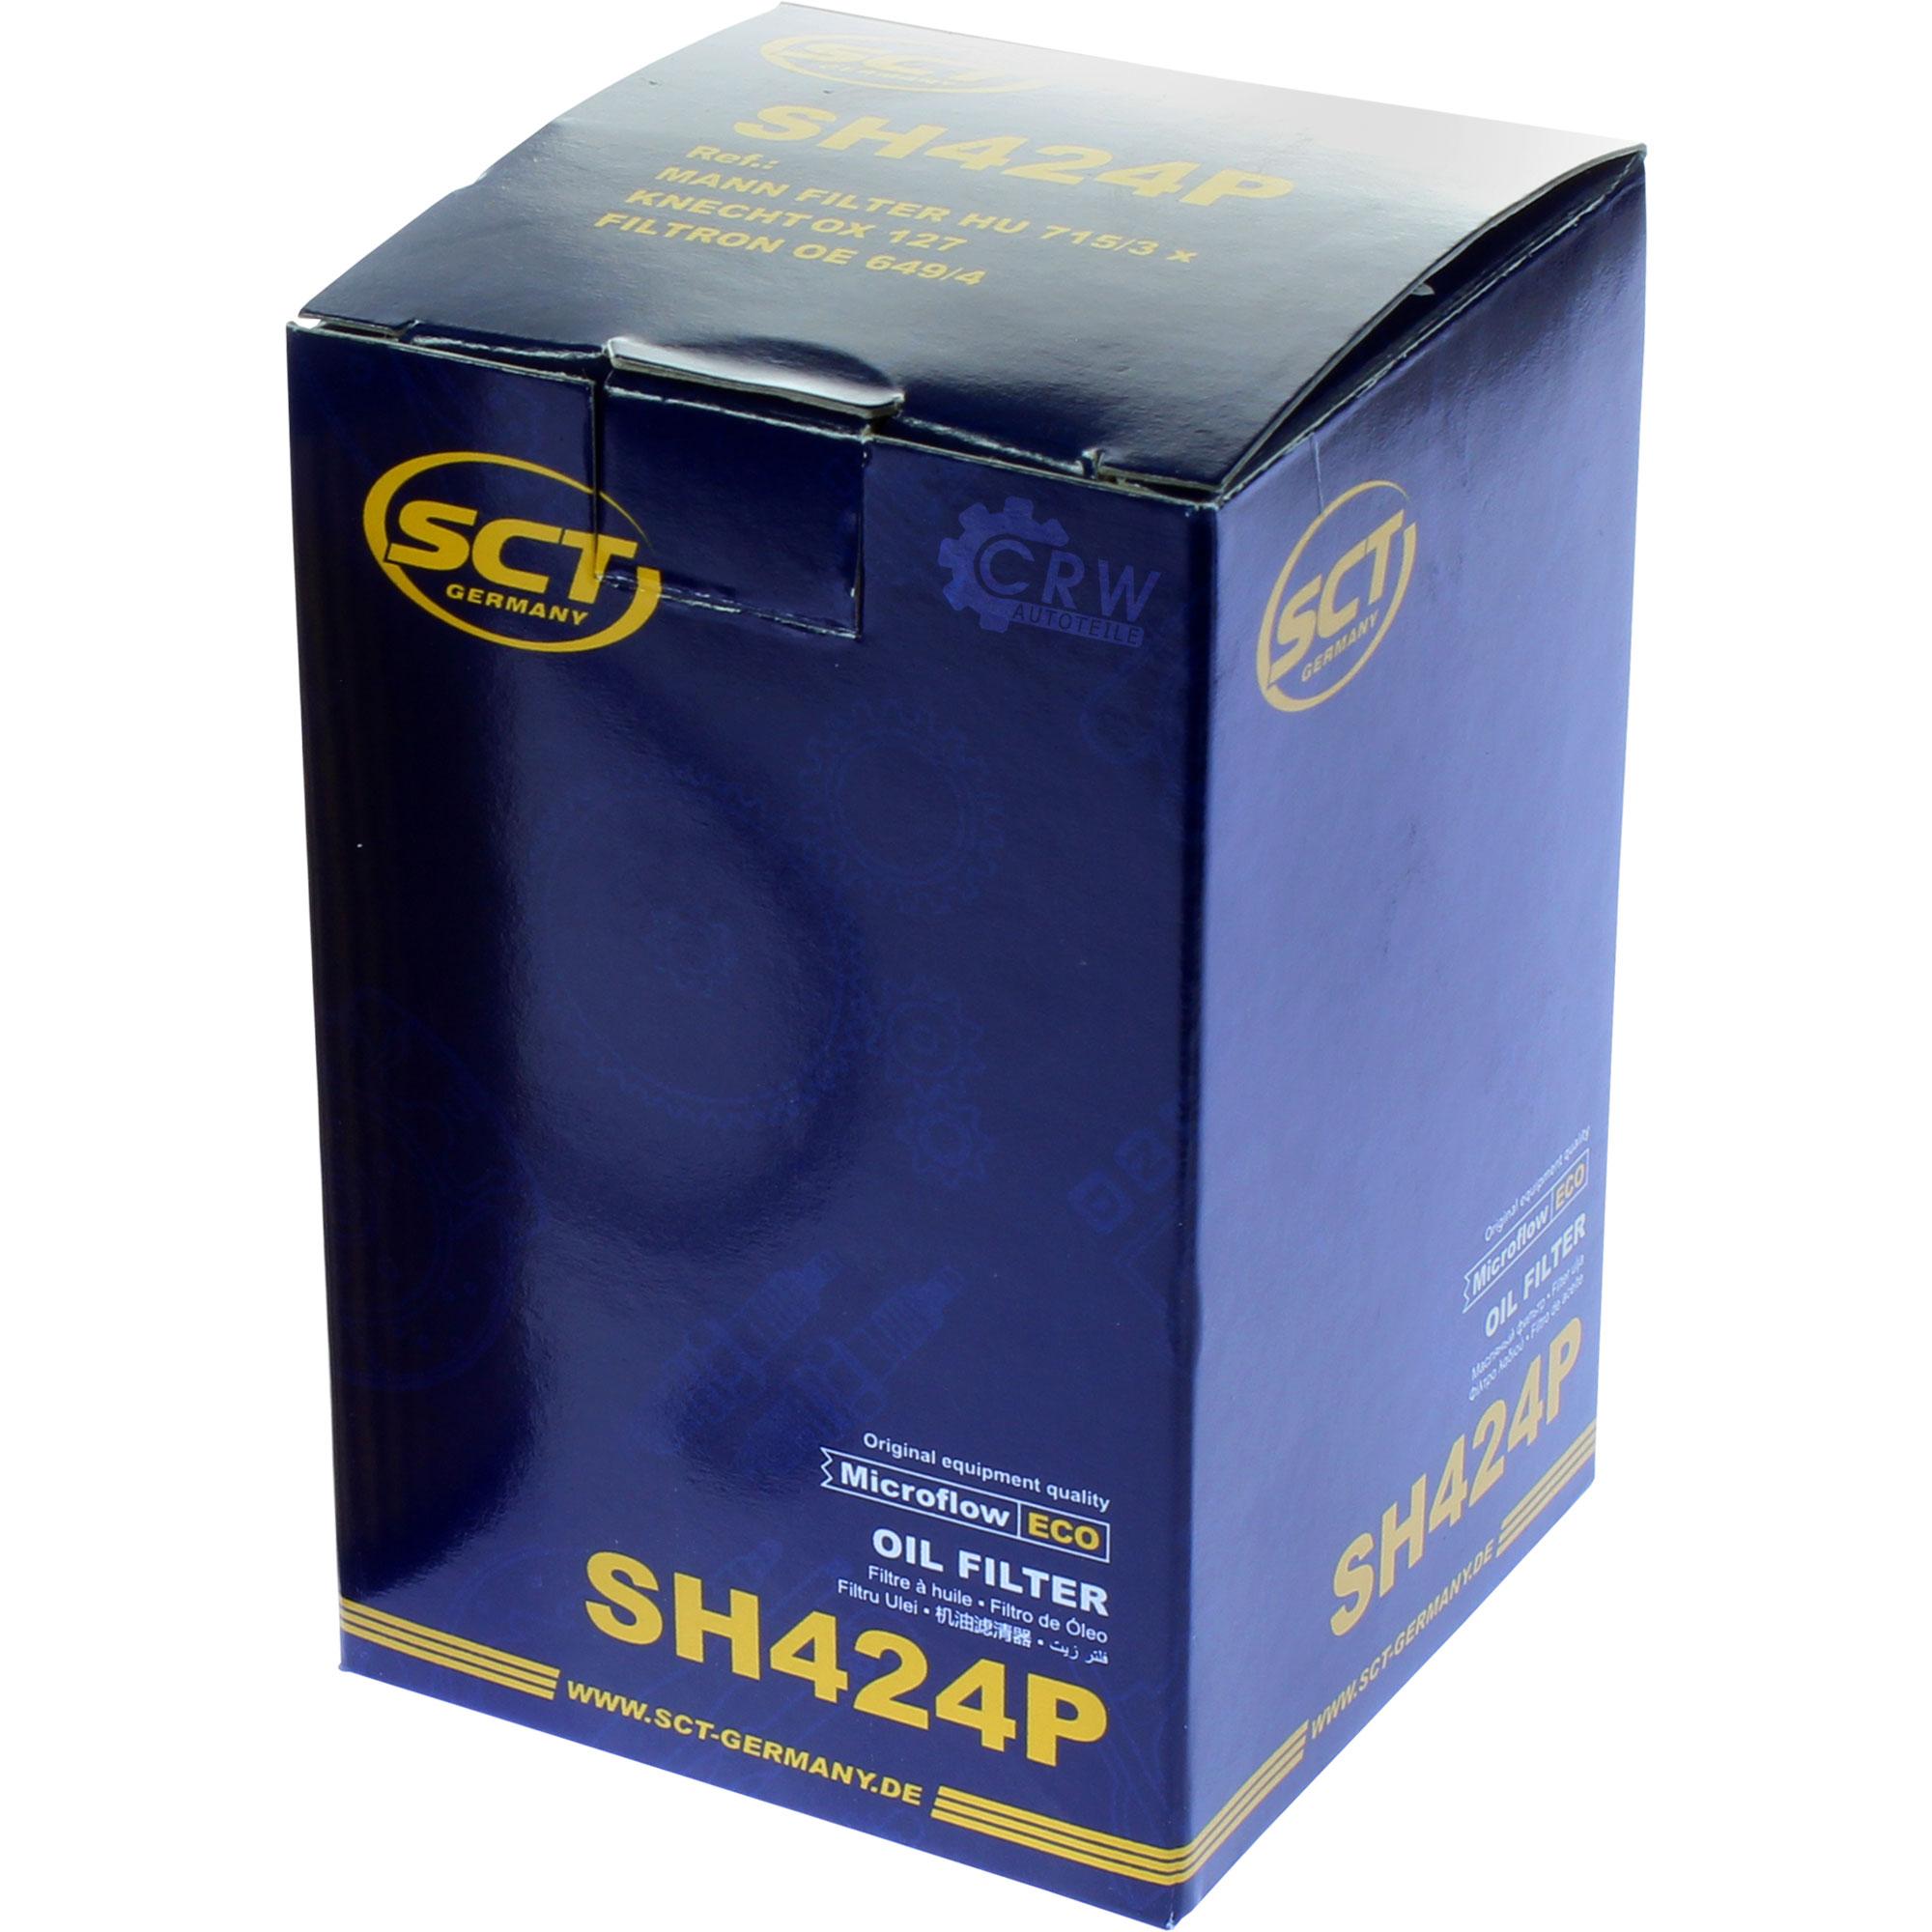 Cambio-de-aceite-set-5l-MANNOL-energy-premium-5w-30-aceite-del-motor-filtro-sct-kit-10140076 miniatura 10